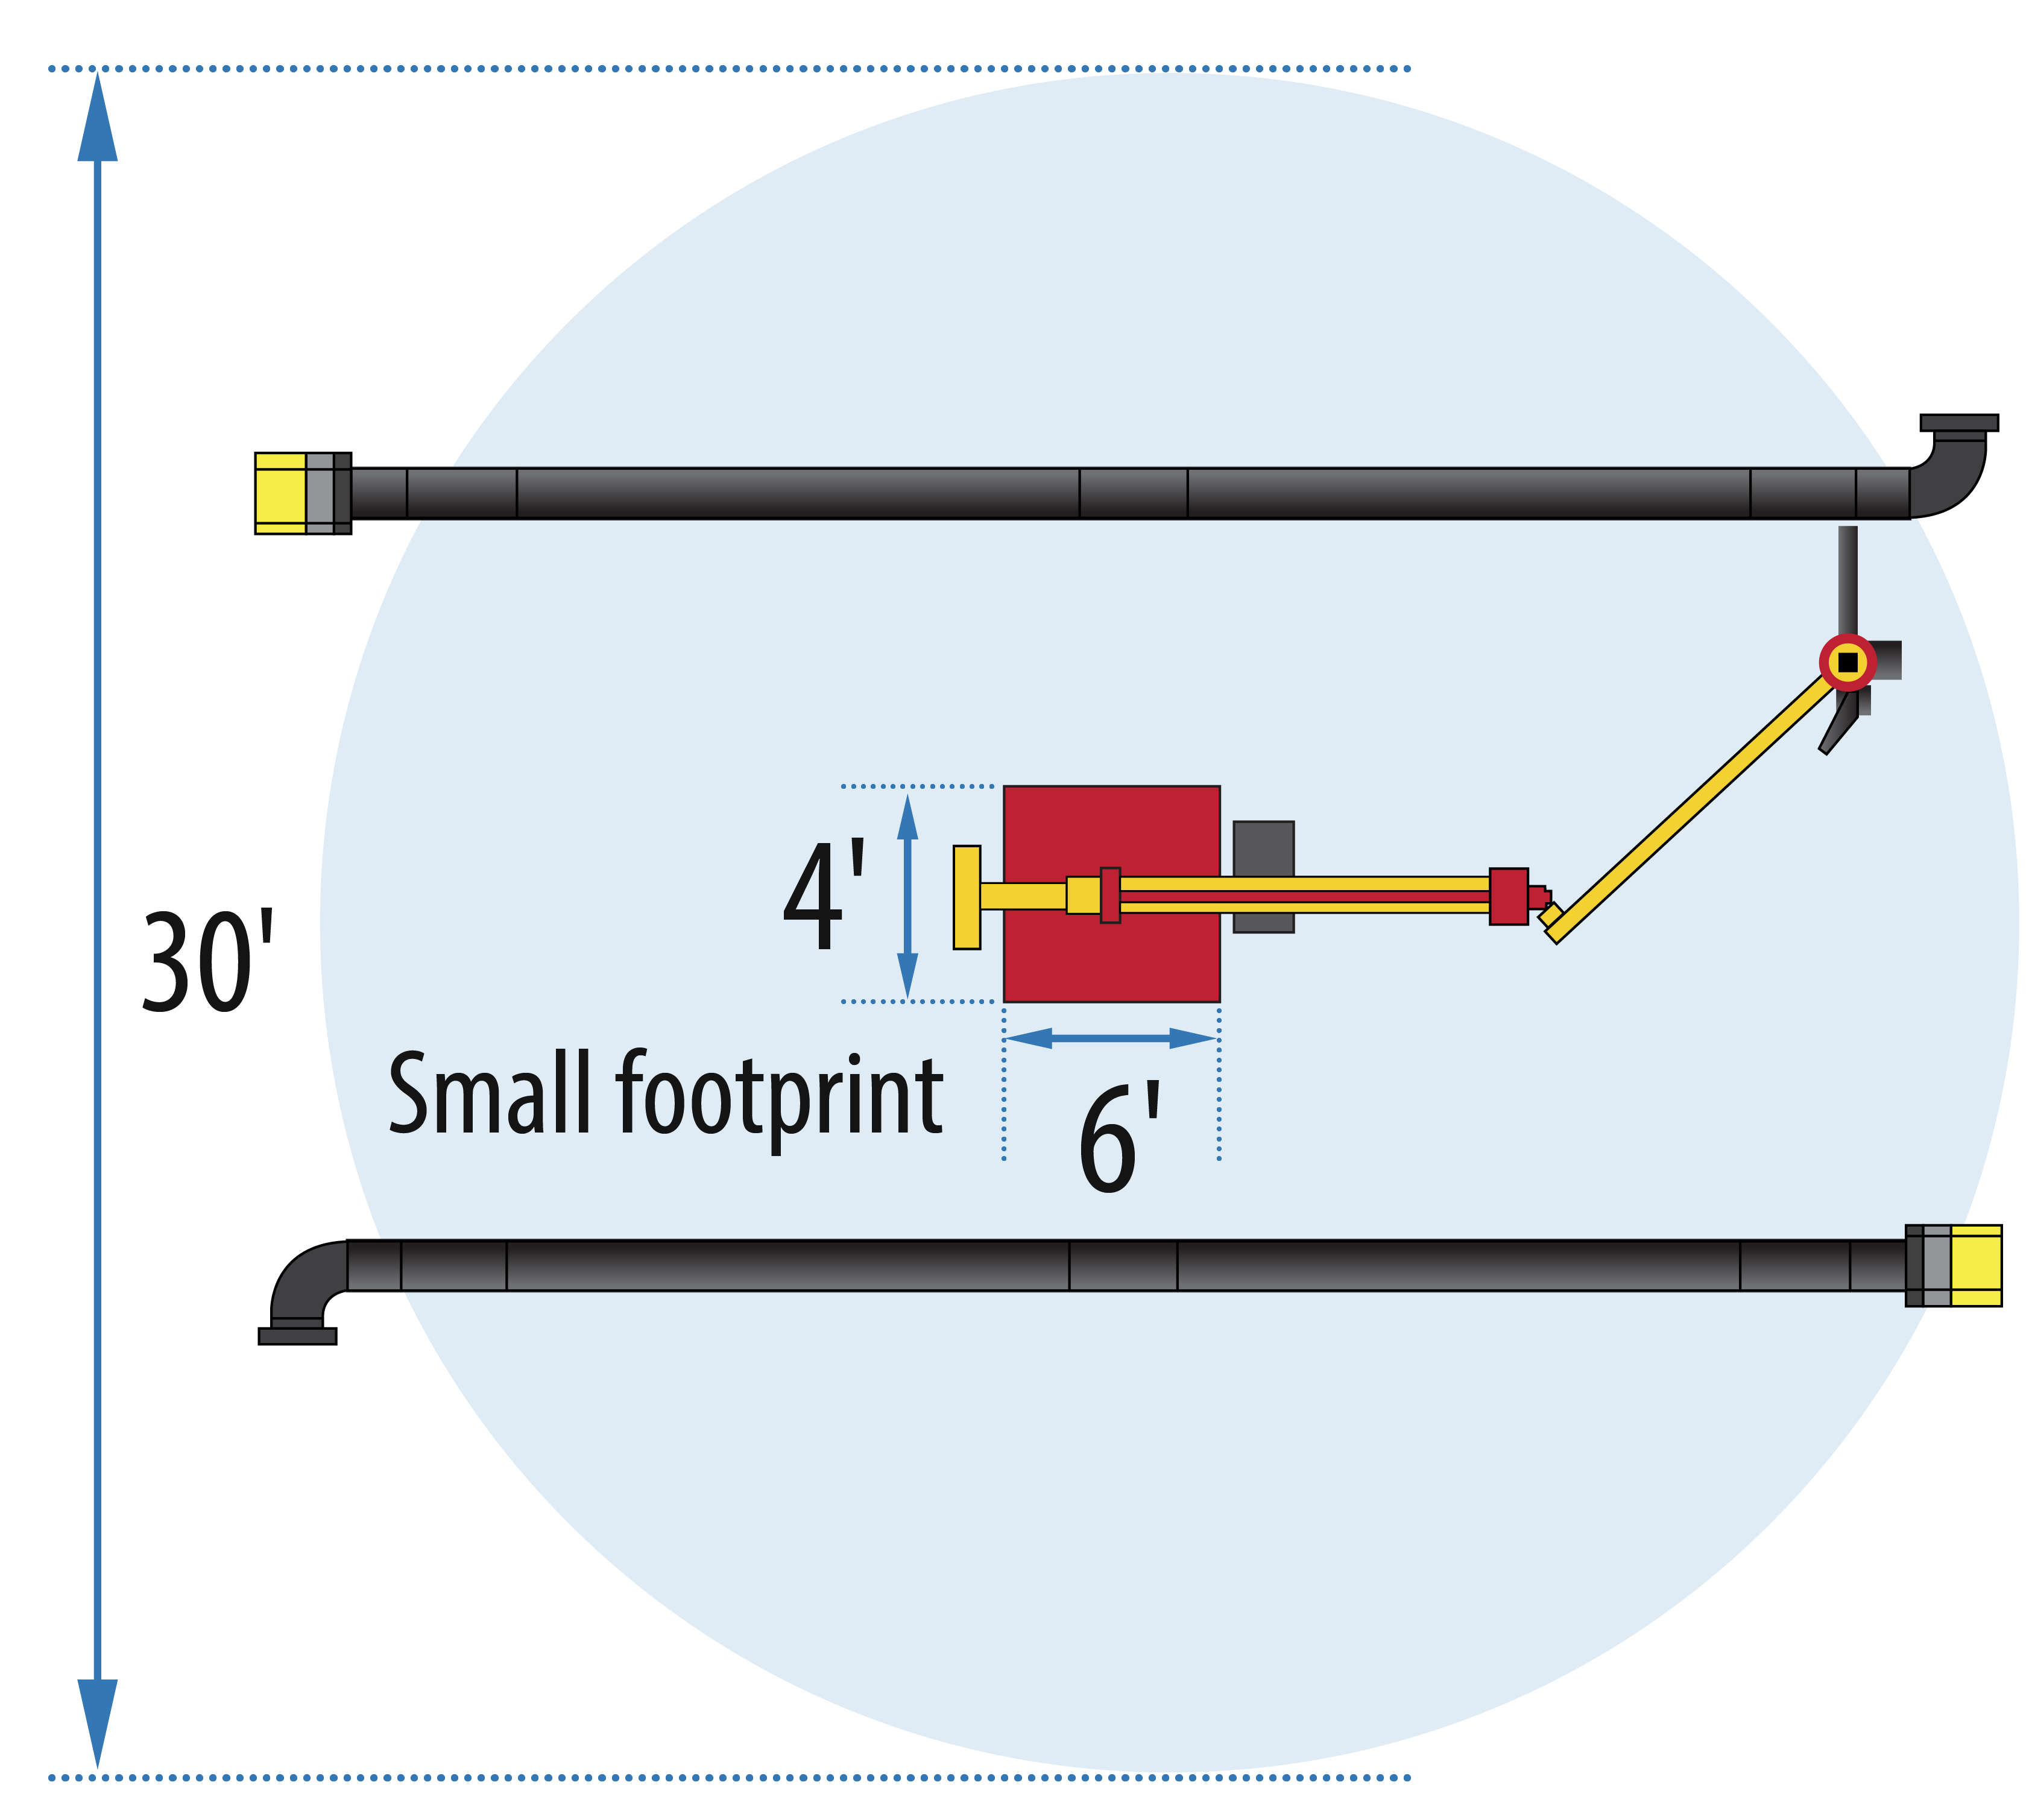 Spool-welding-robot-small-footrpint-01.png